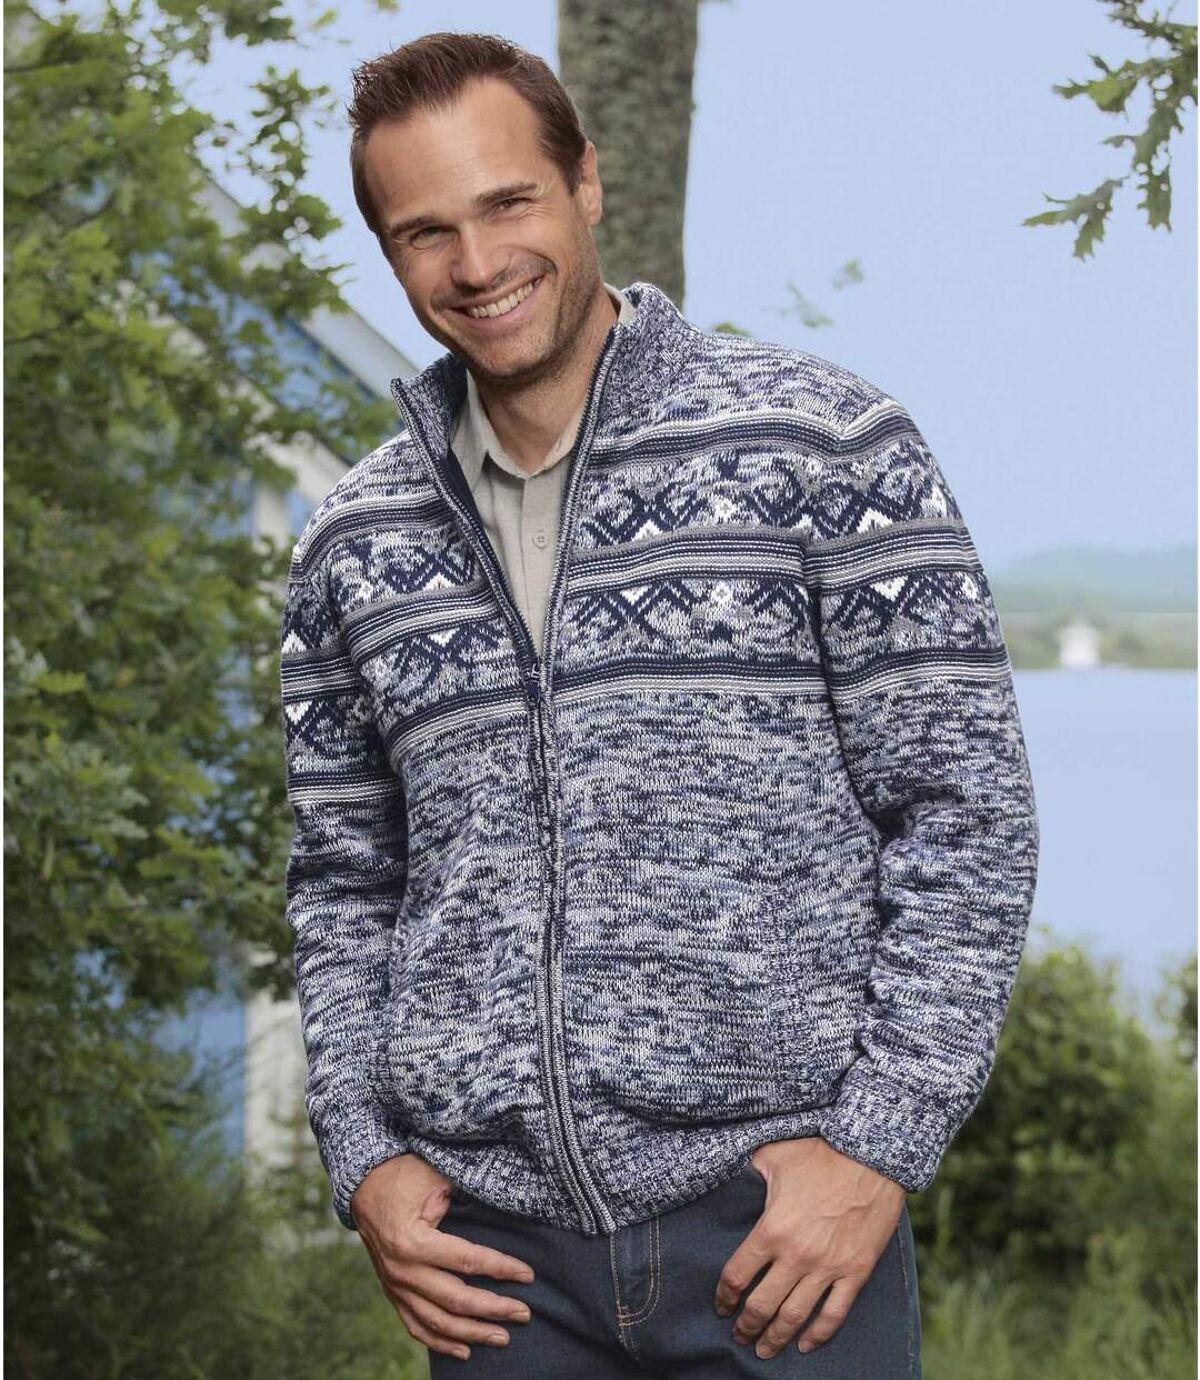 Fleecový svetr Nordic súpletem Atlas For Men